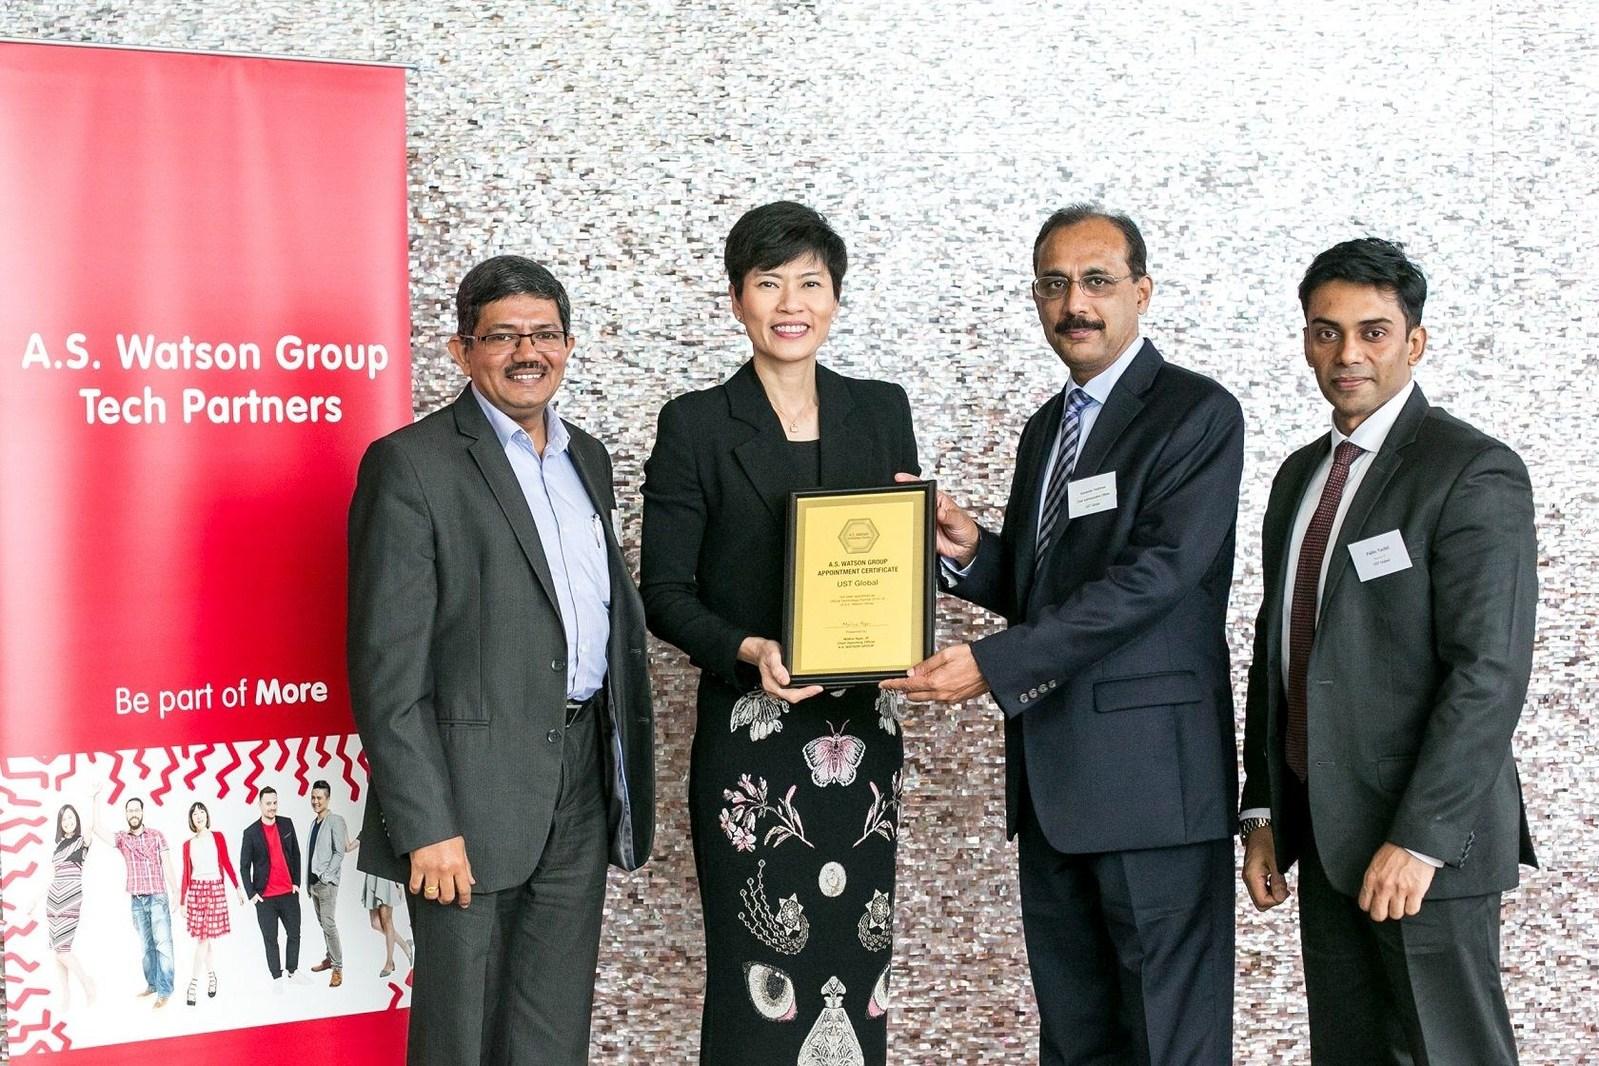 AS Watson UST Global Partnership